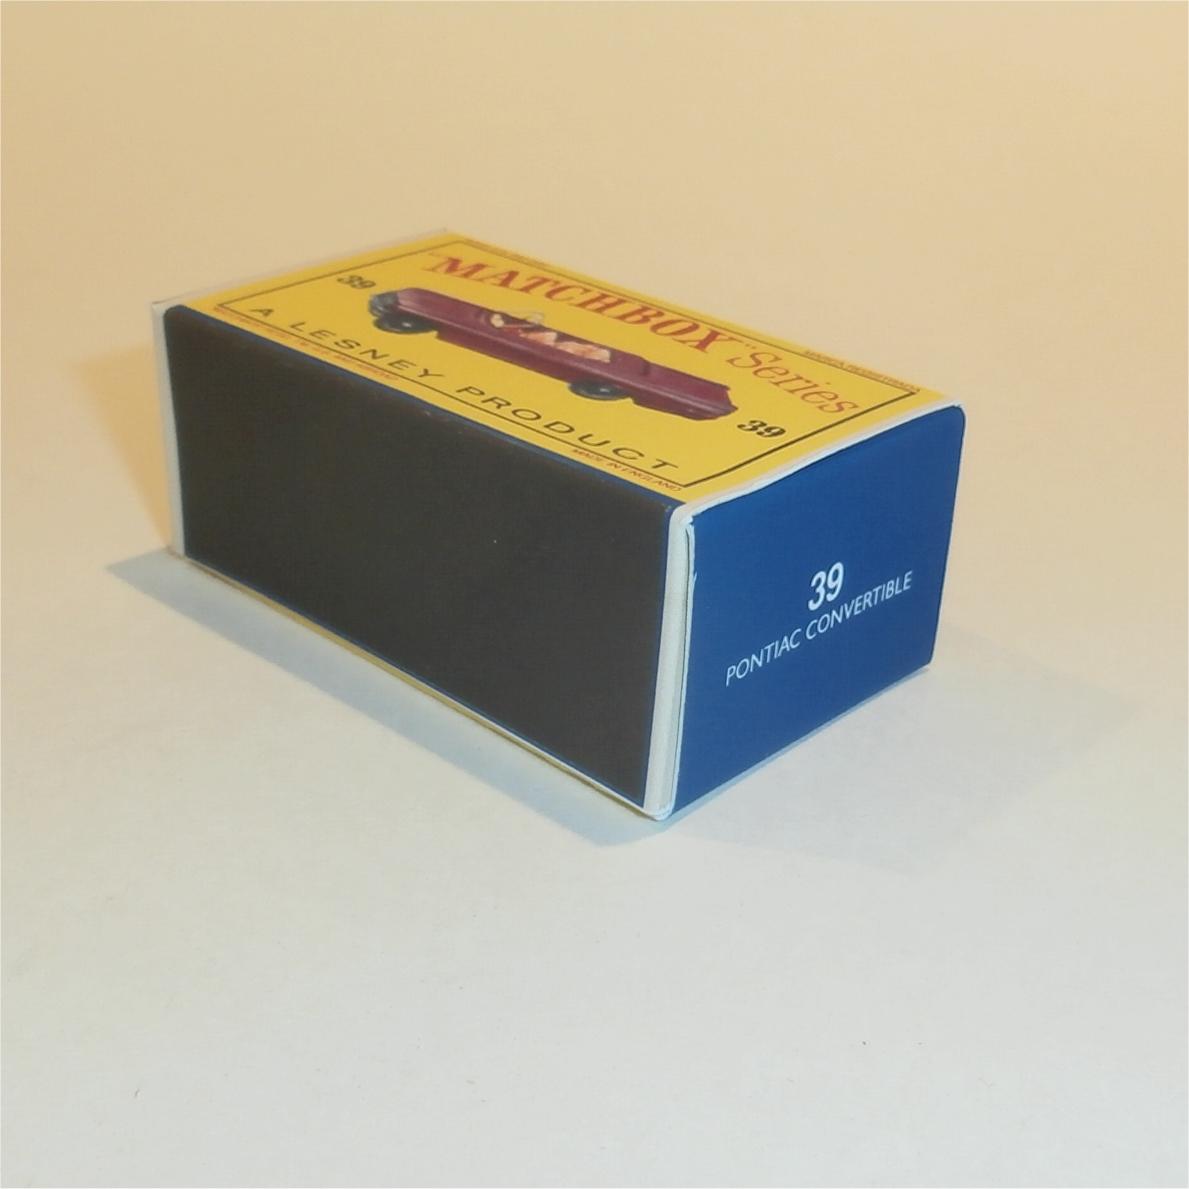 matchbox lesney 39 b pontiac convertible empty repro d style box ebay. Black Bedroom Furniture Sets. Home Design Ideas